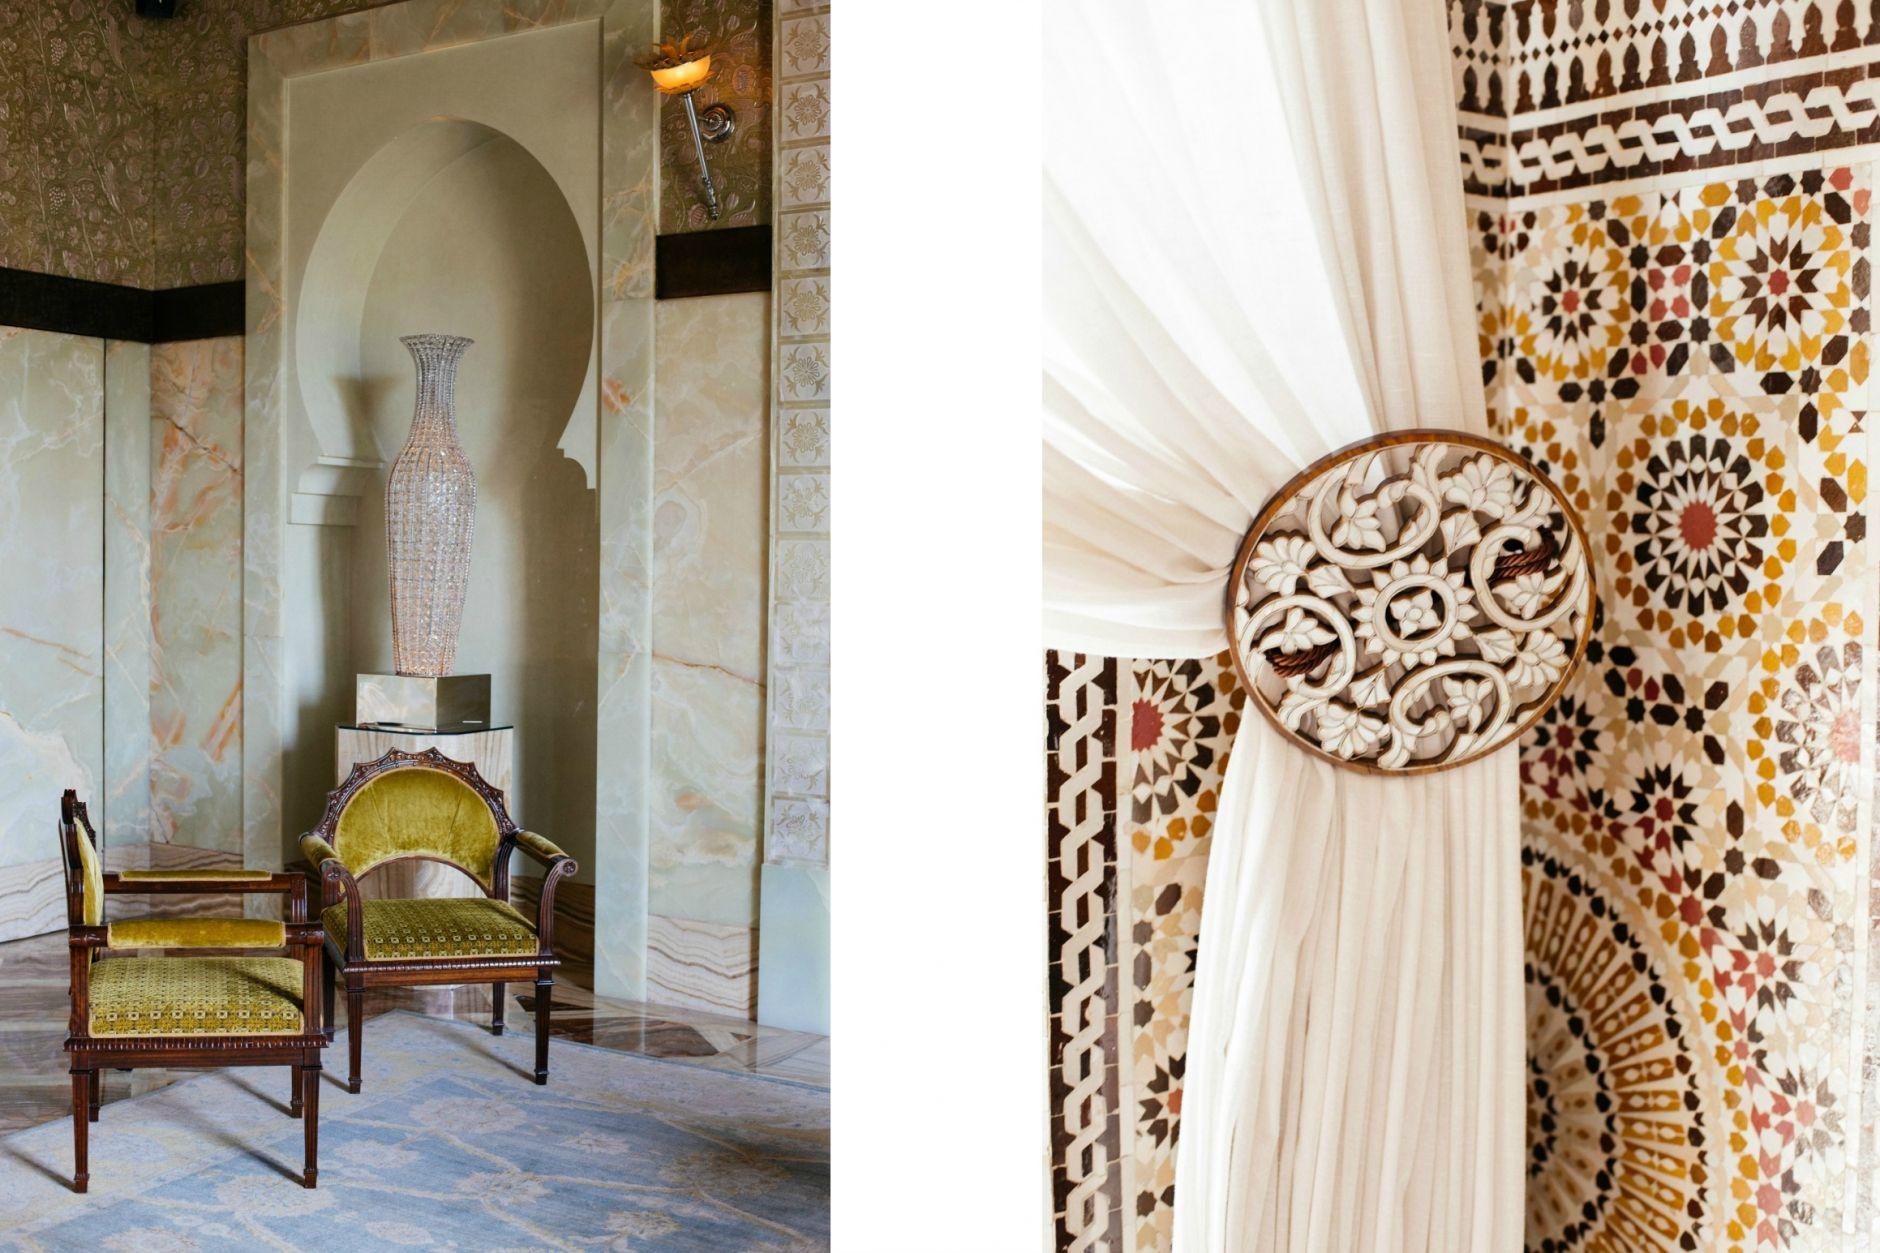 royal-mansour-hotel-luxury-marrakesch-marrakesh-morocco-edisa-shahini-disicouture-blog-duo-09